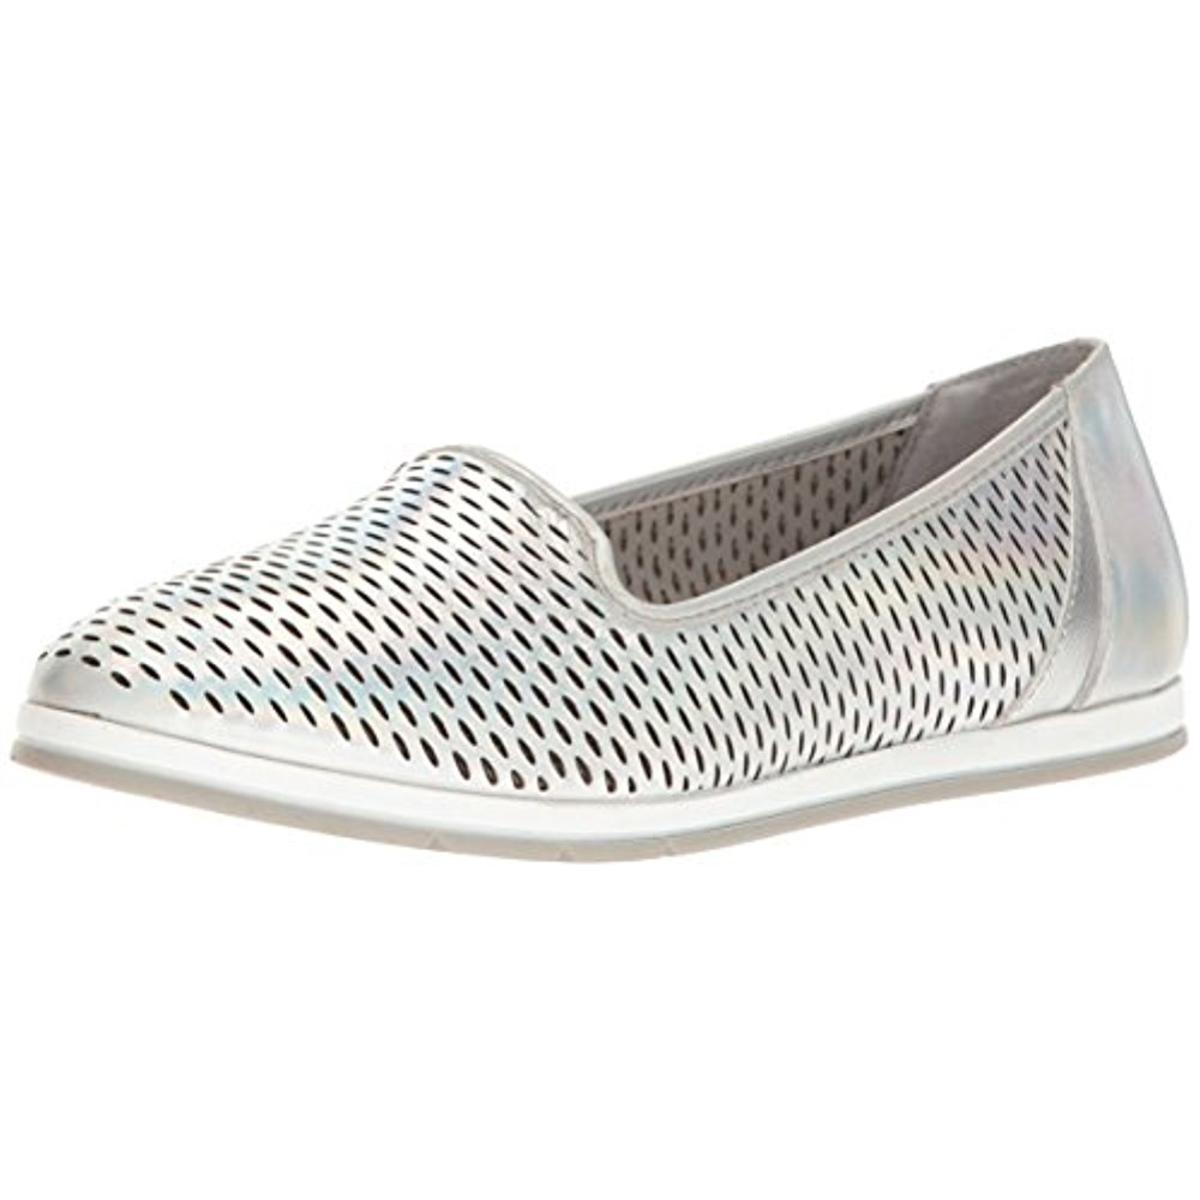 Aerosoles Womens Smart Move Leather Closed Toe Slide Silver Leather Size 7.0 P